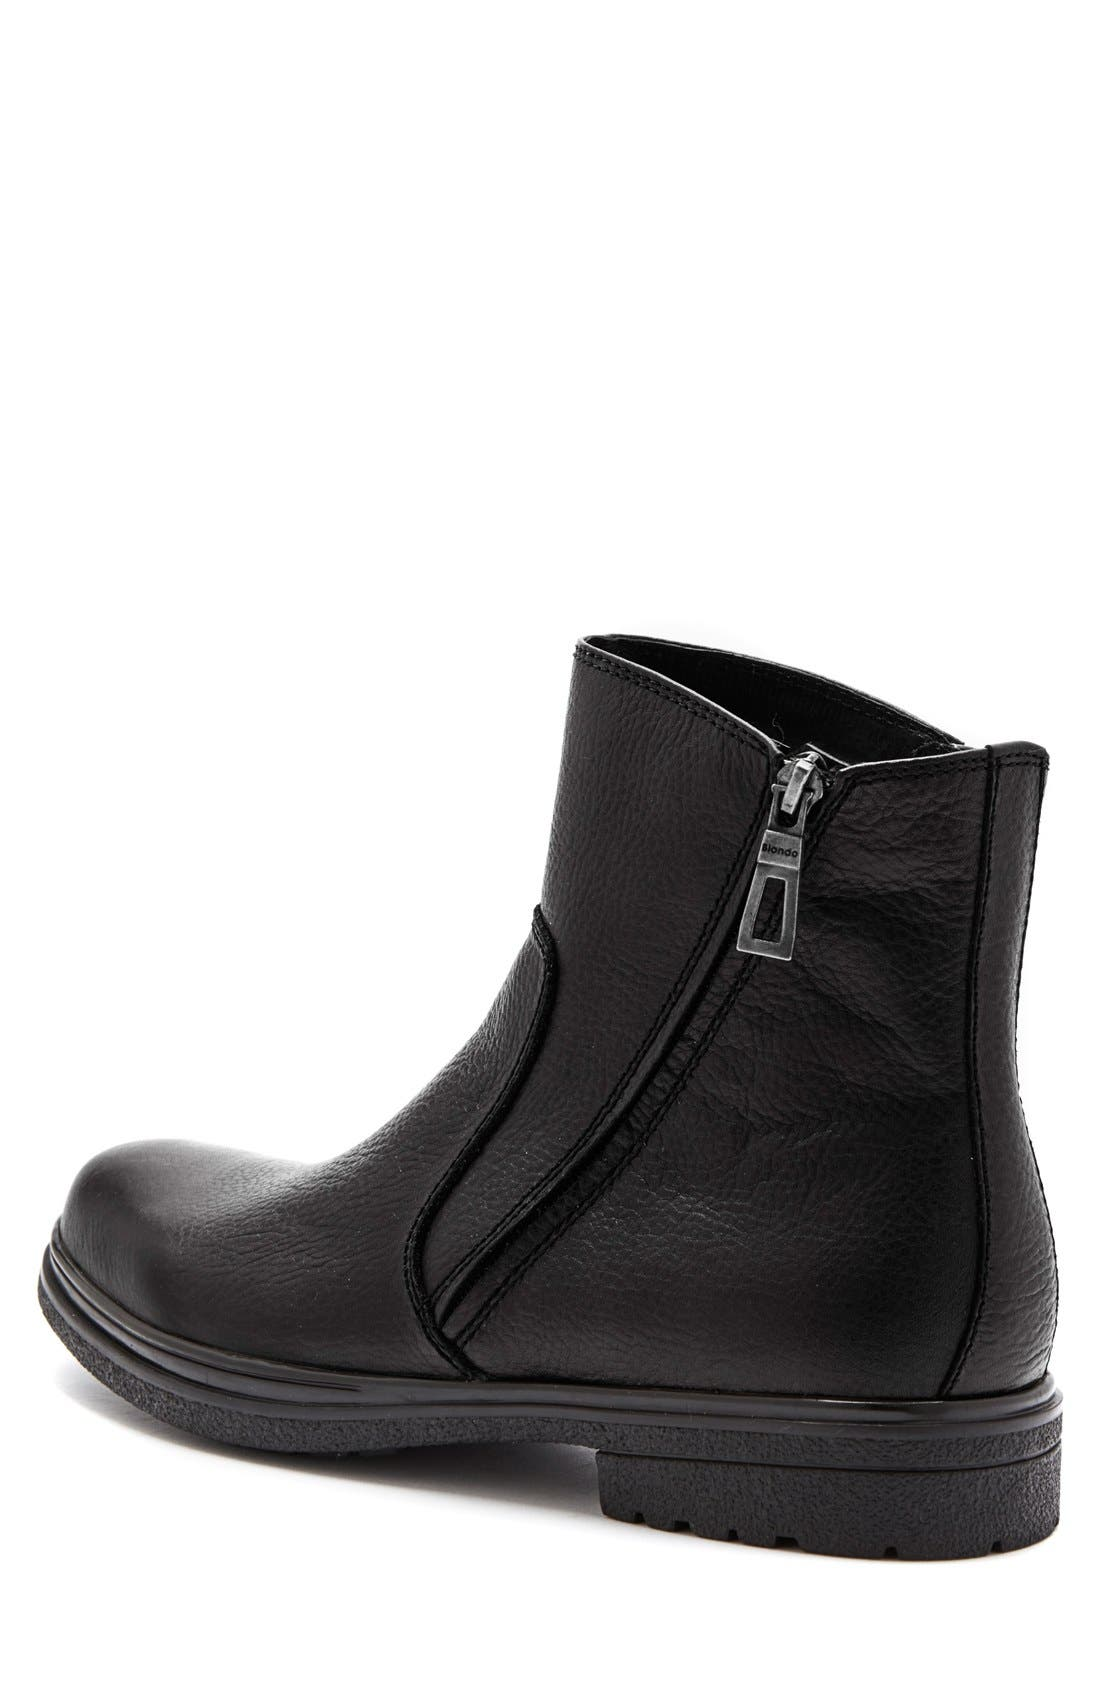 Alternate Image 2  - Blondo 'Brawn' Waterproof Zip Boot (Men)